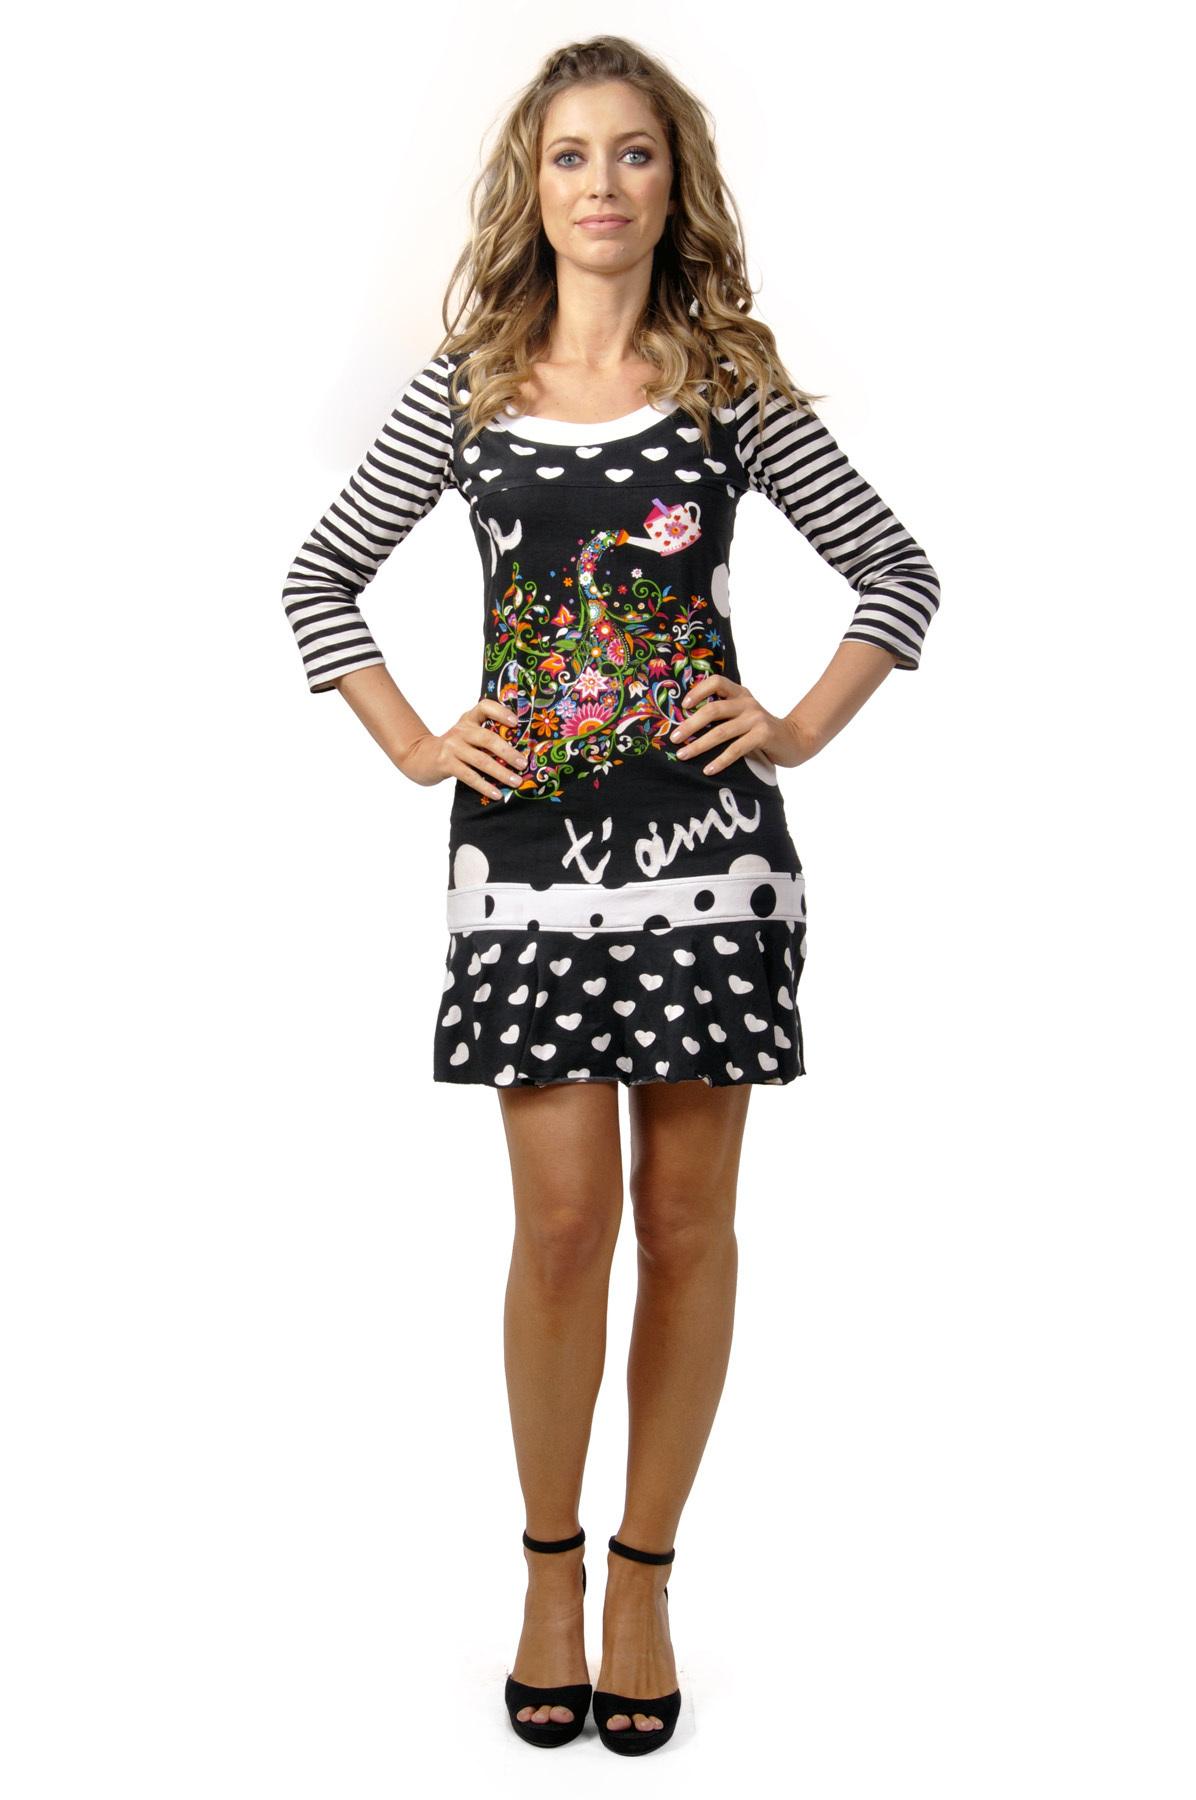 Savage Culture: Wonderland Rose Garden Embroidered Short Dress Carolina (1 Left!) SAVAGE_30212